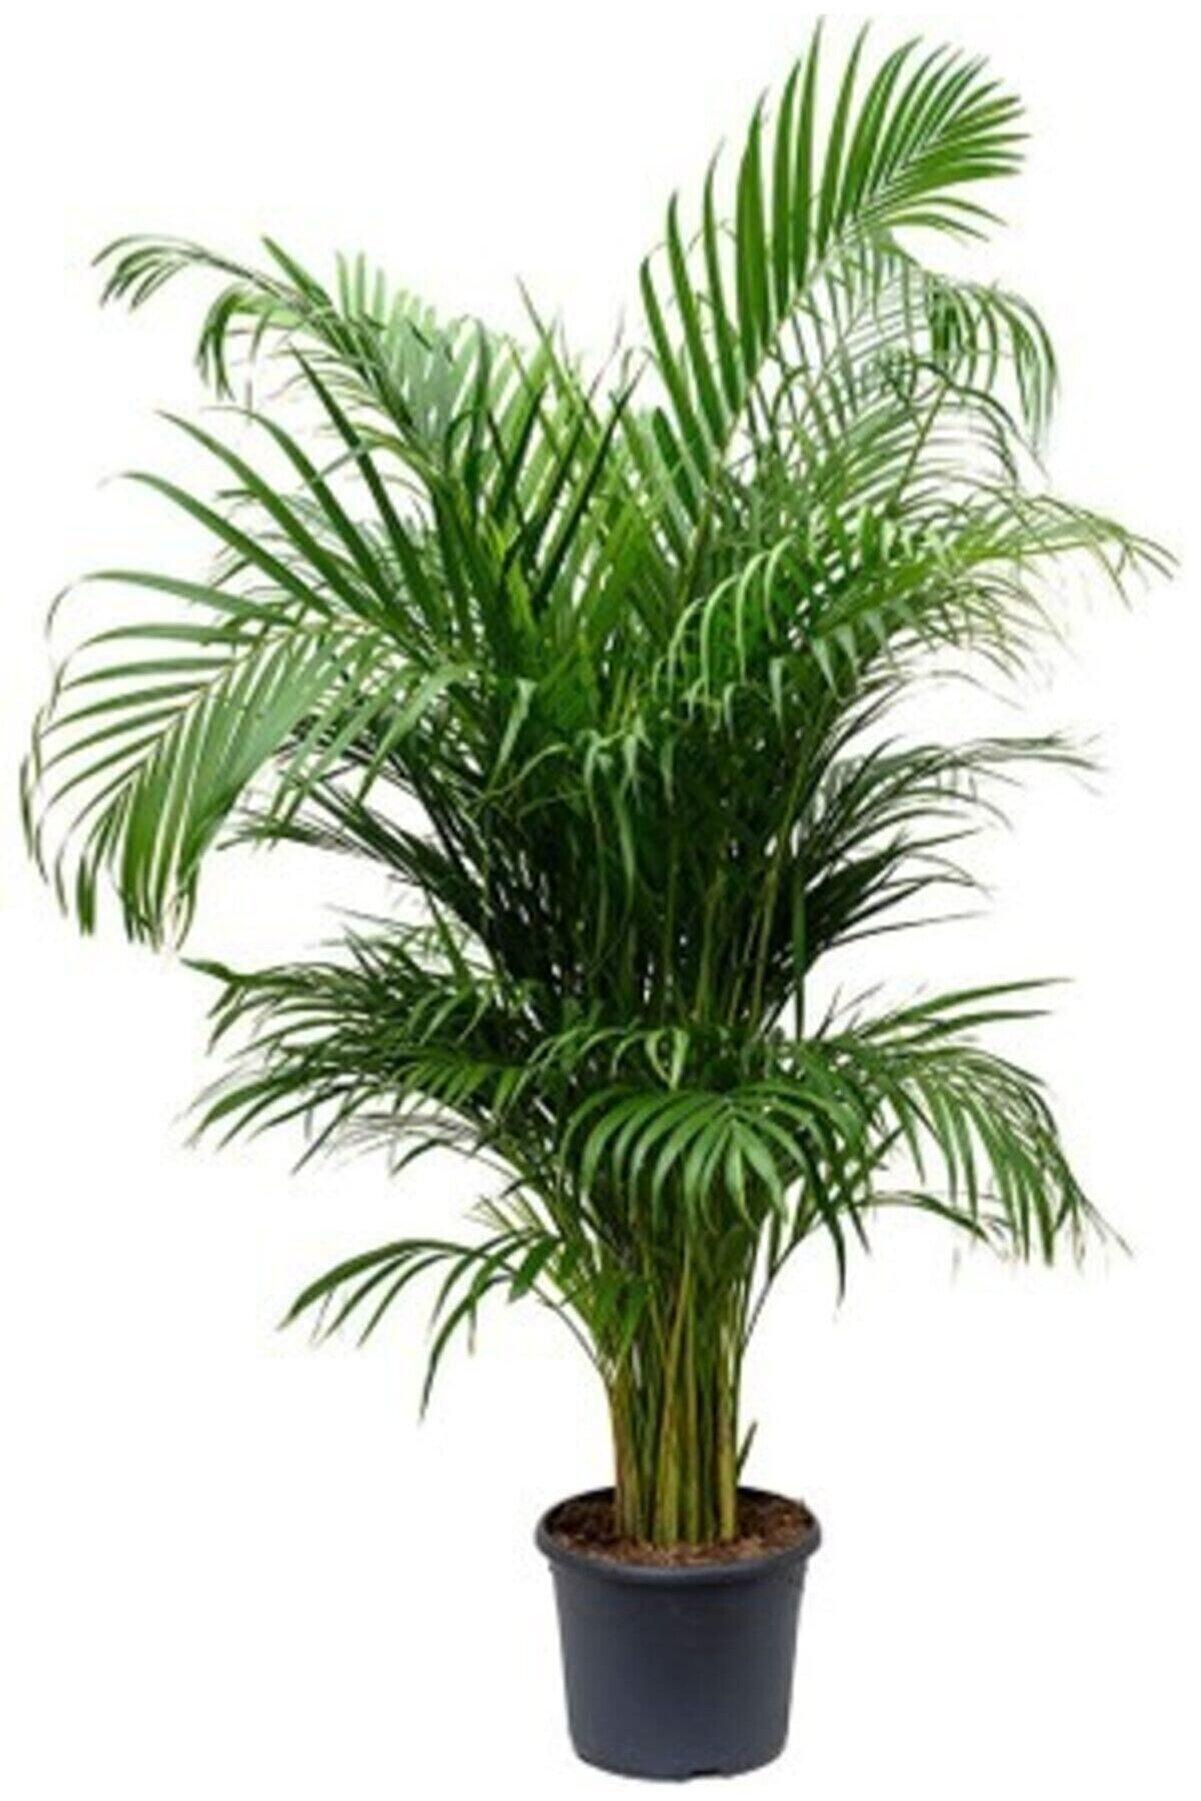 Orkide Pazarı Areka Palmiyesi Areca Lutescens 140 - 150 Cm